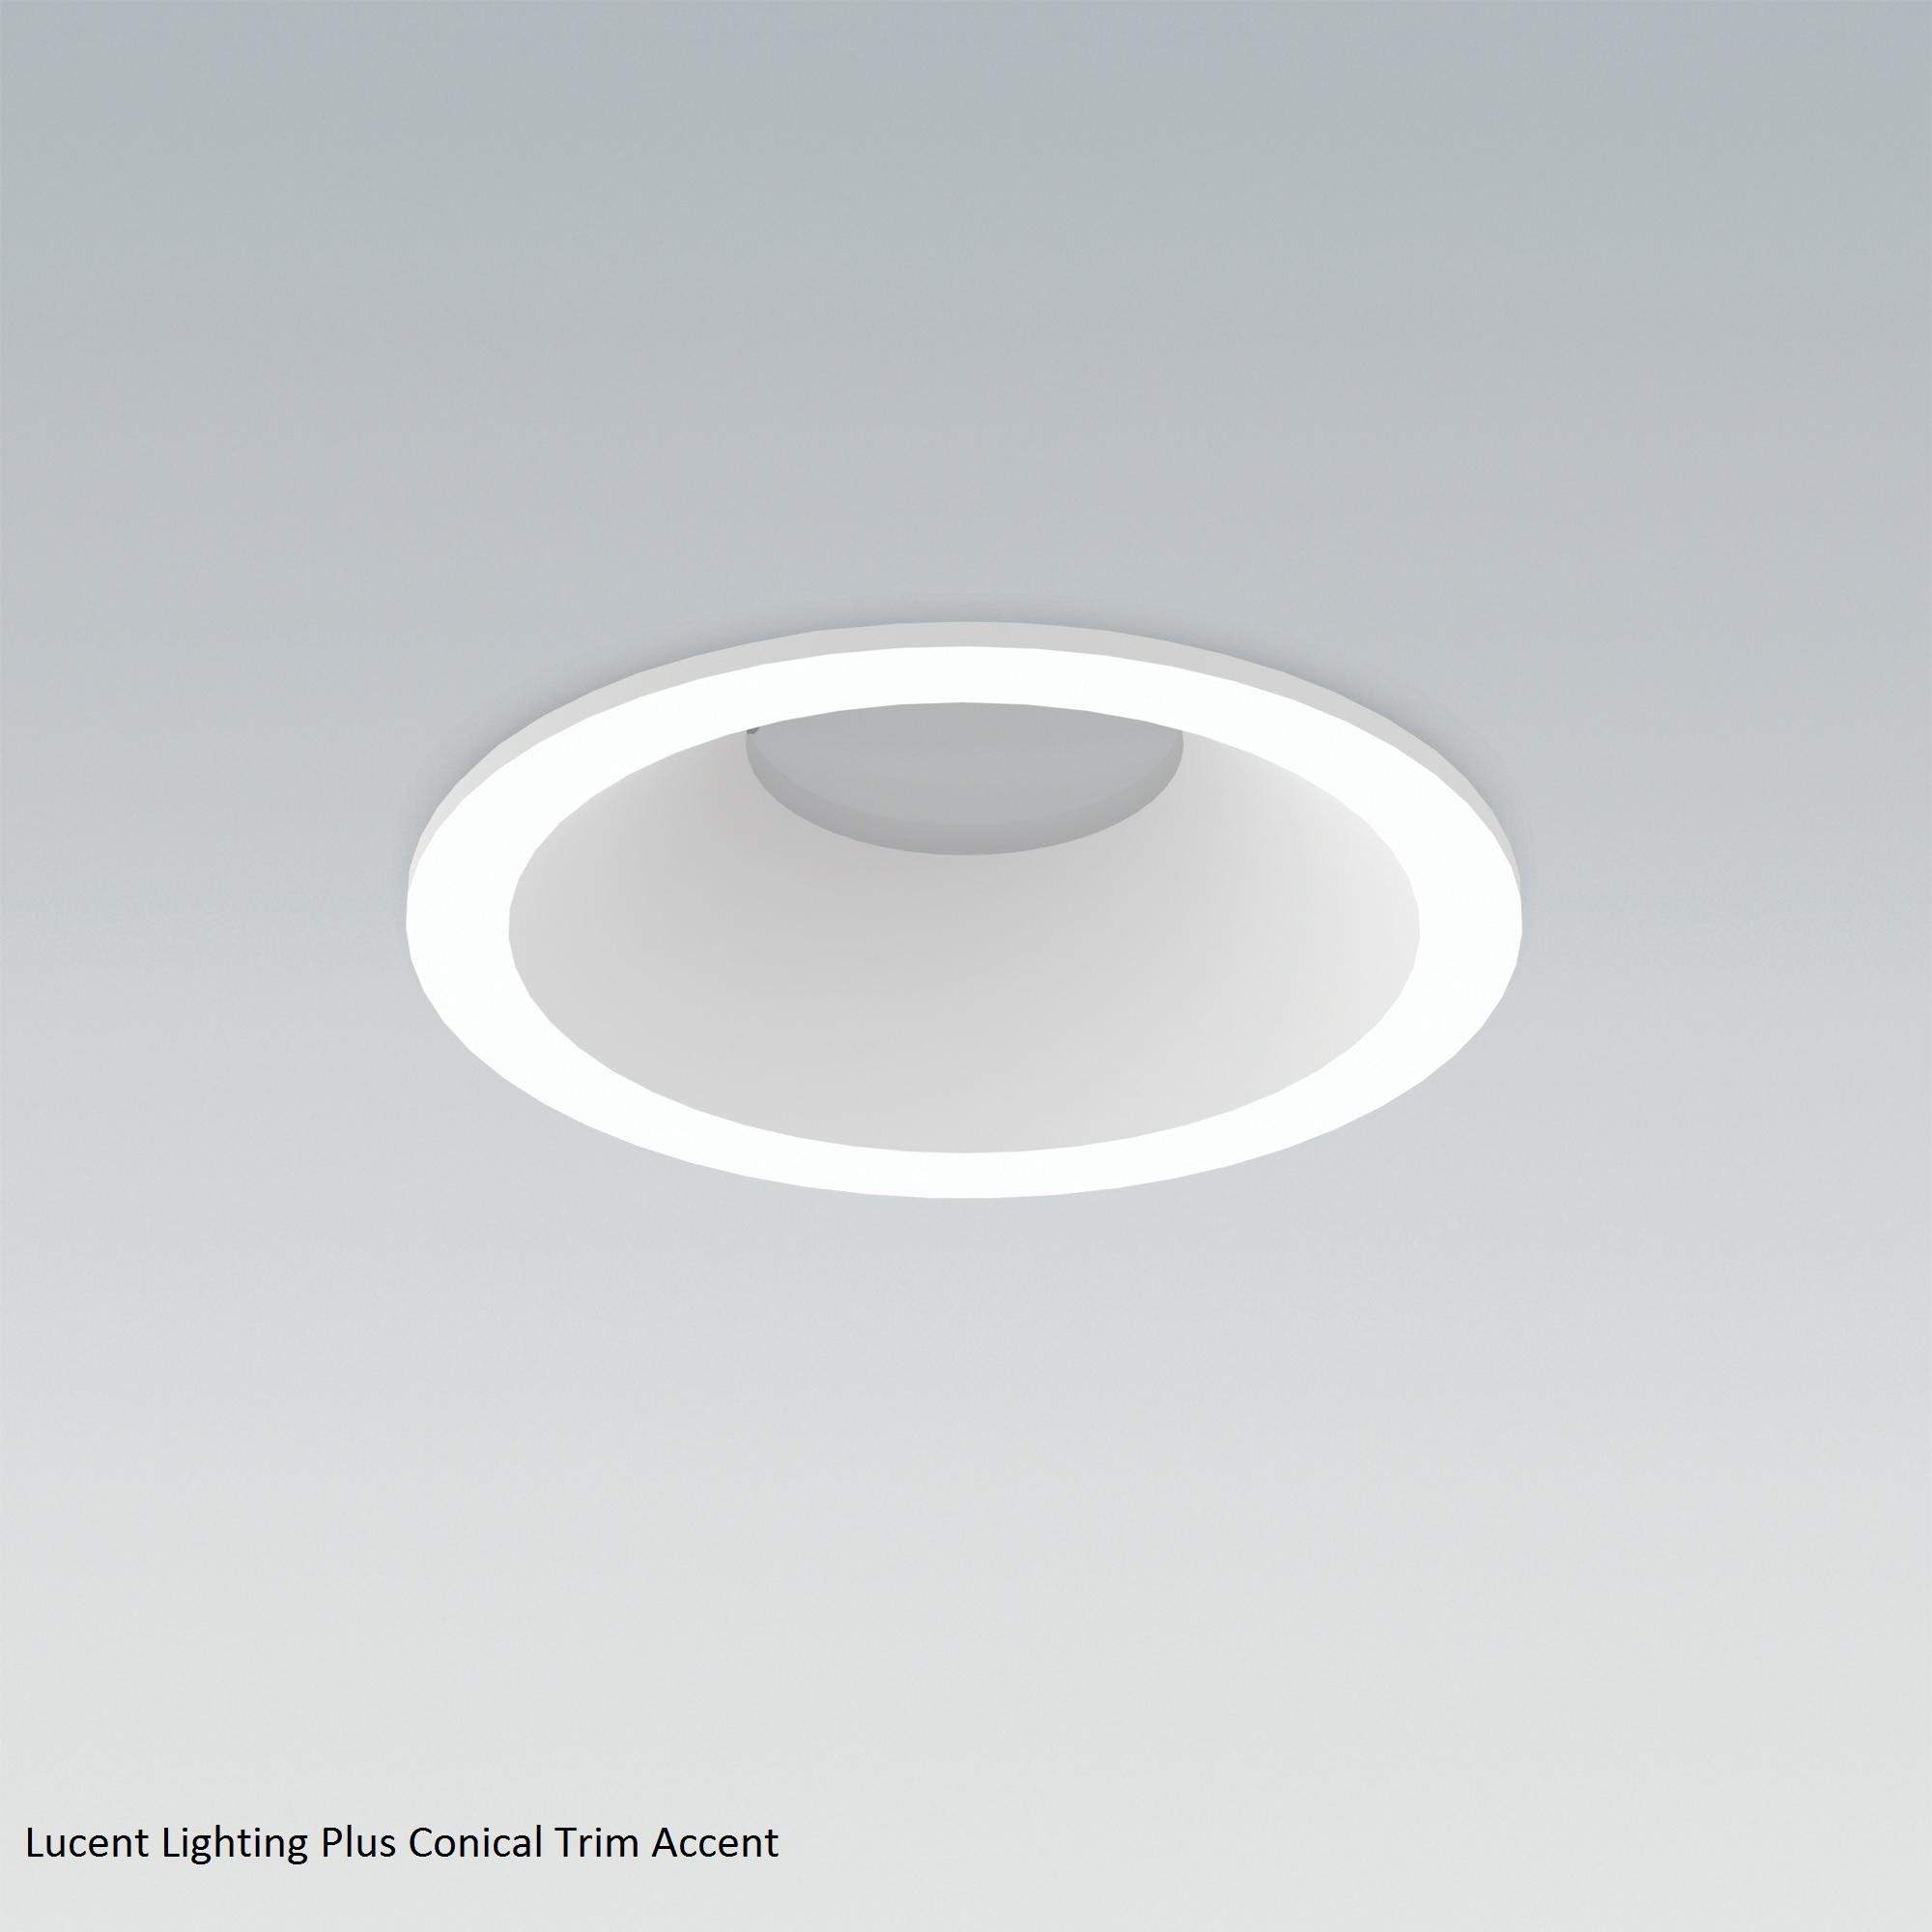 lucent-lighting-plus-conical-trim-accent